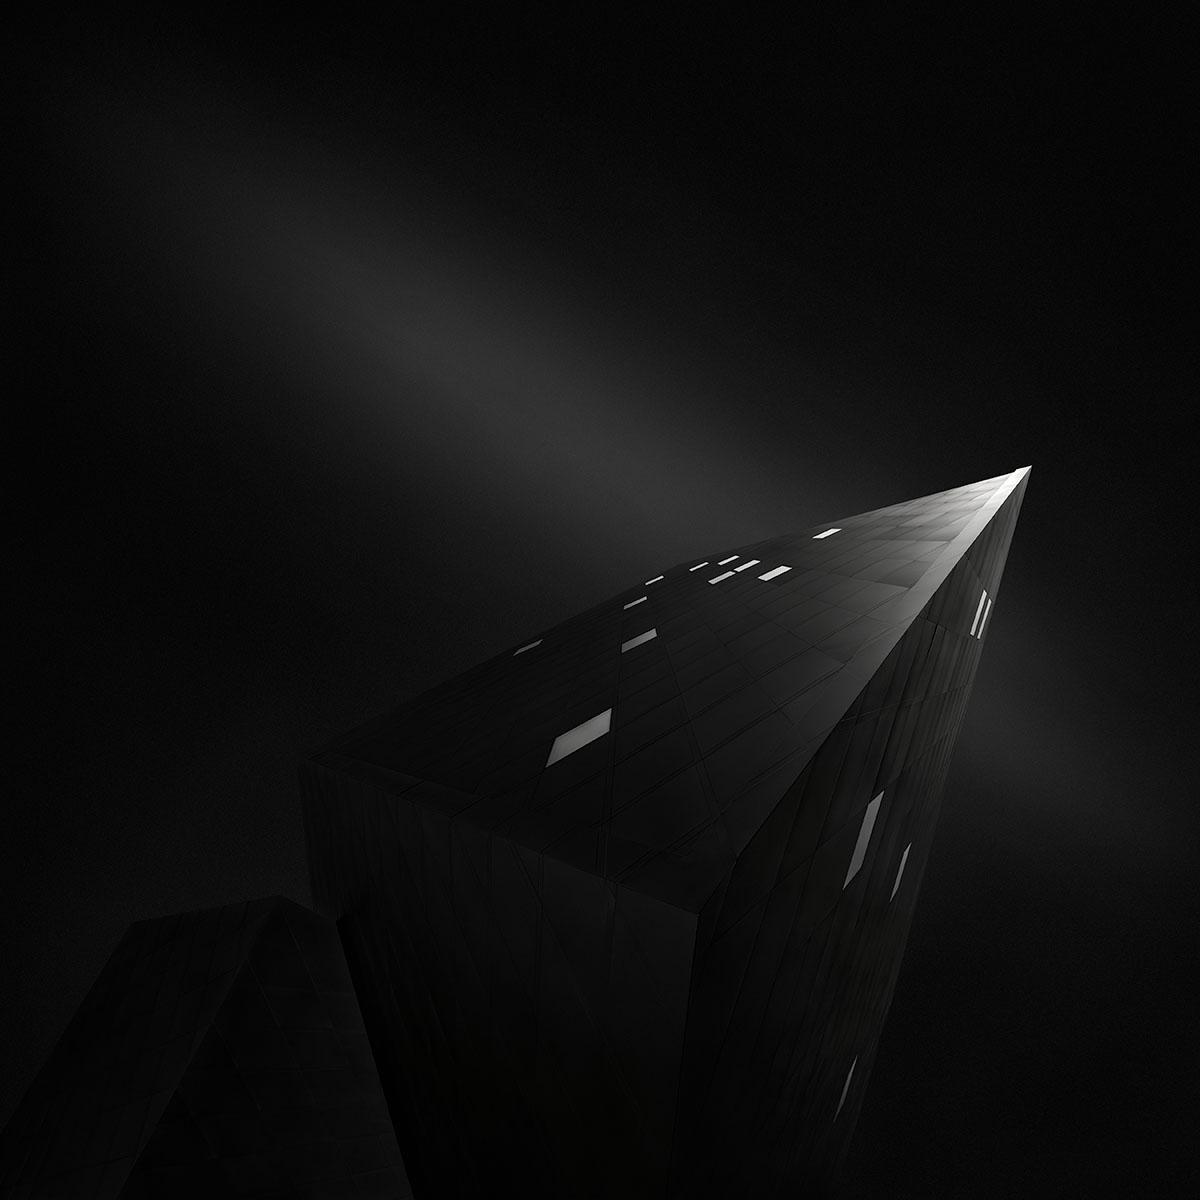 Ode to Black (Black Hope) II - Anima Black © Julia Anna Gospodarou - Recreating the subject in fine art photography.